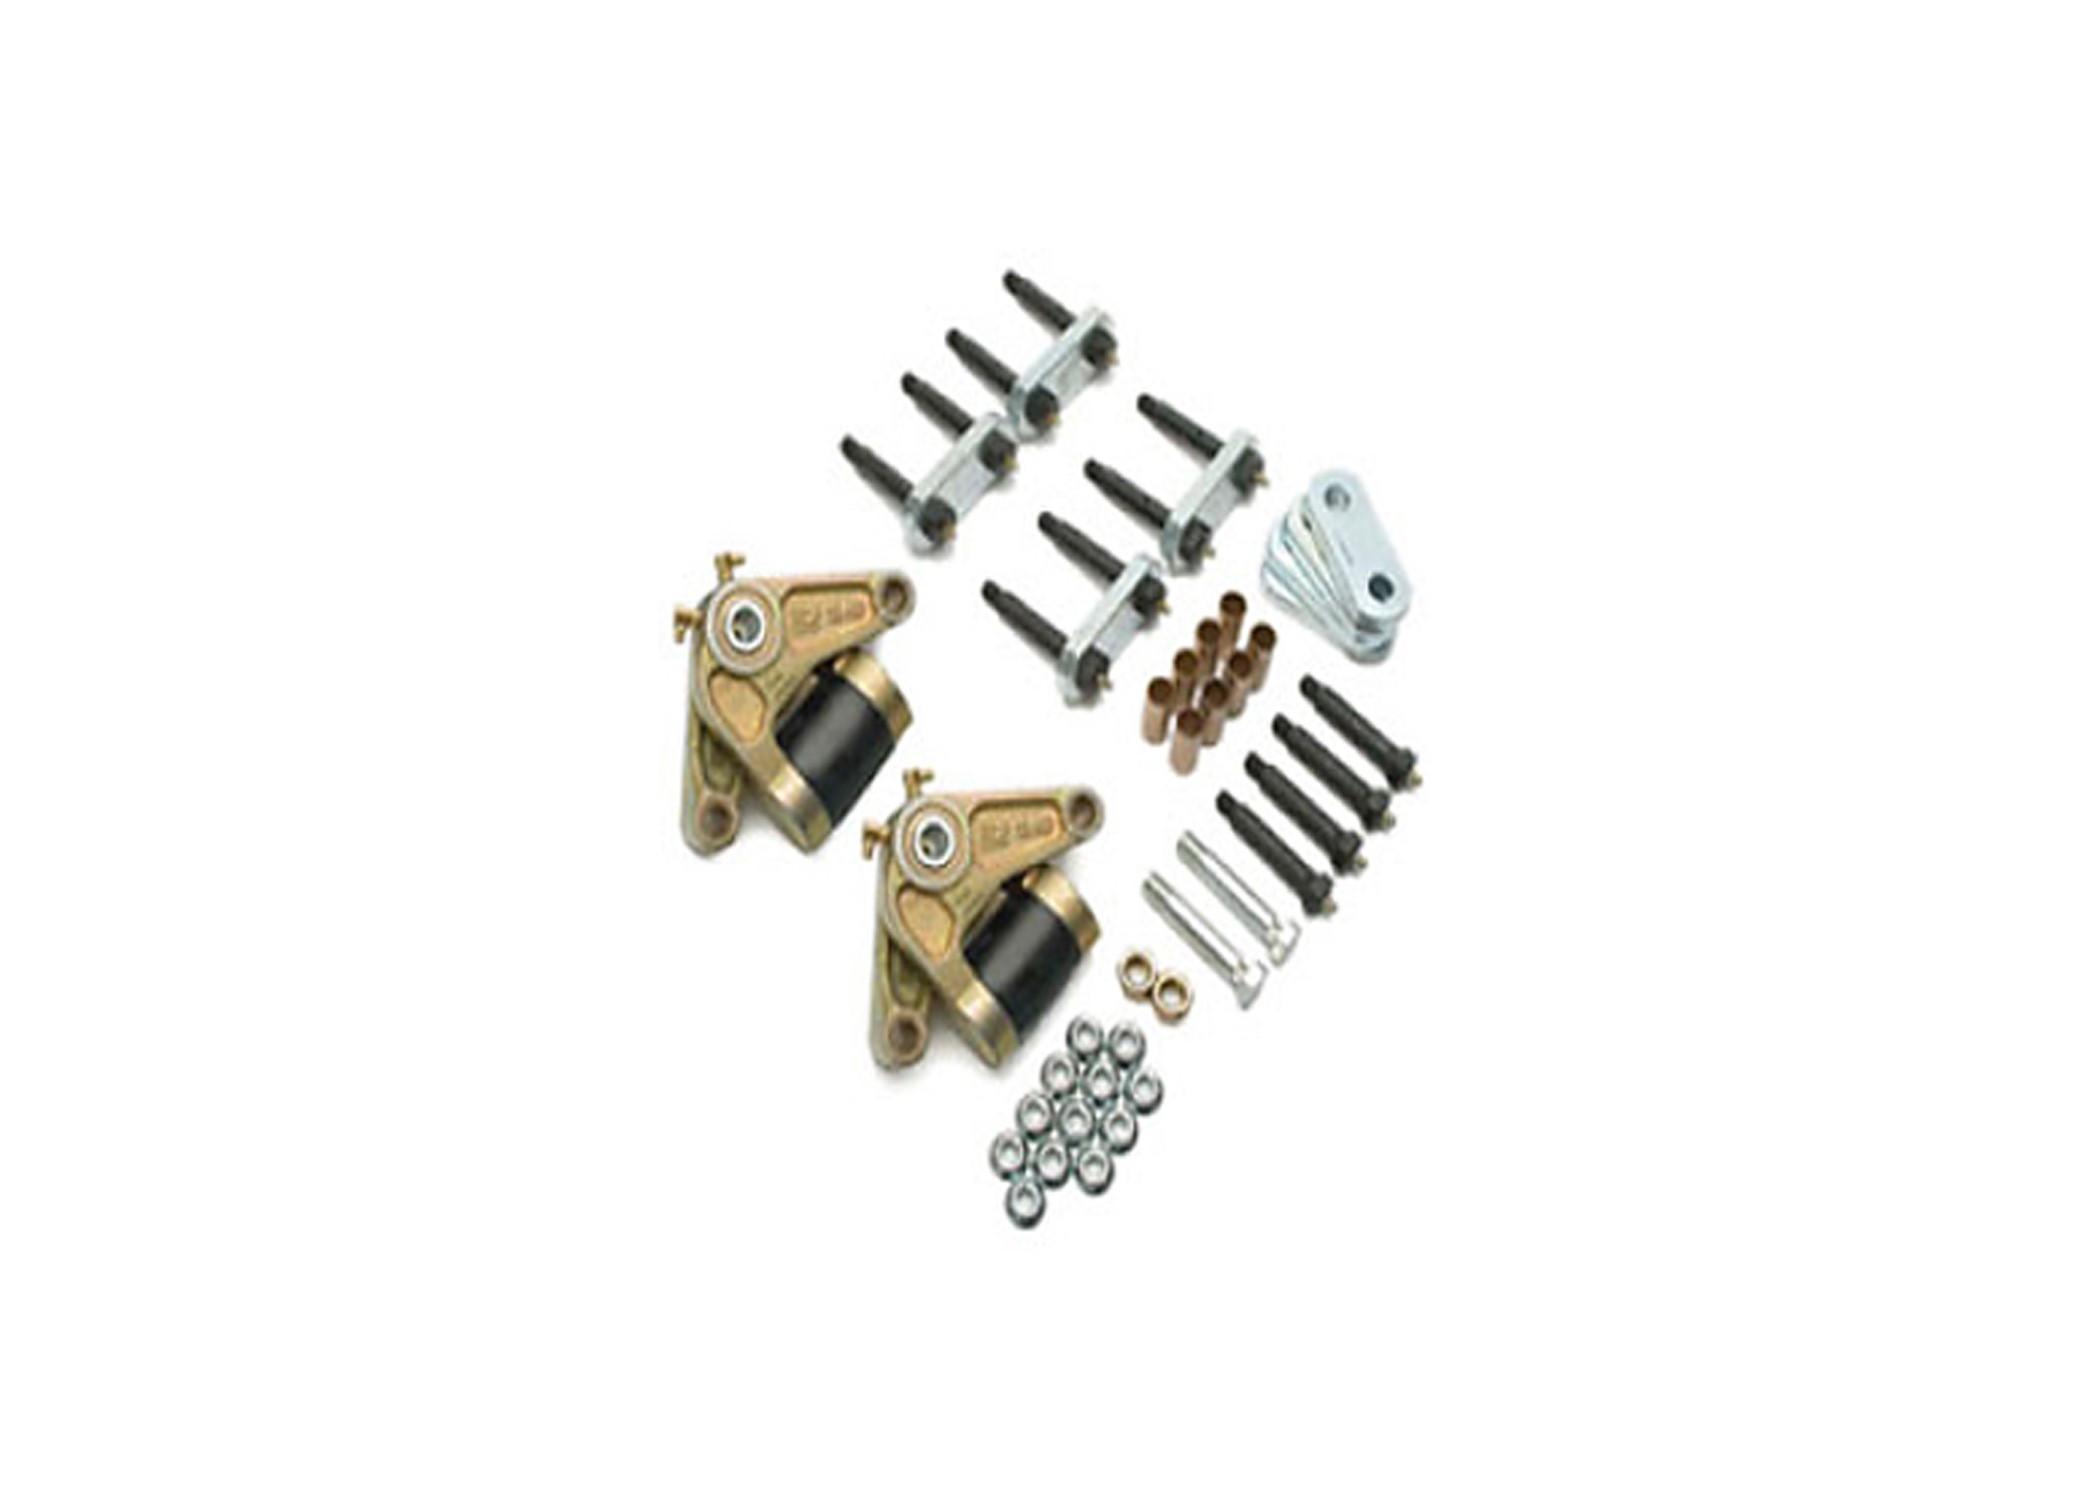 E Z Flex Suspension Kit Tandem Axle